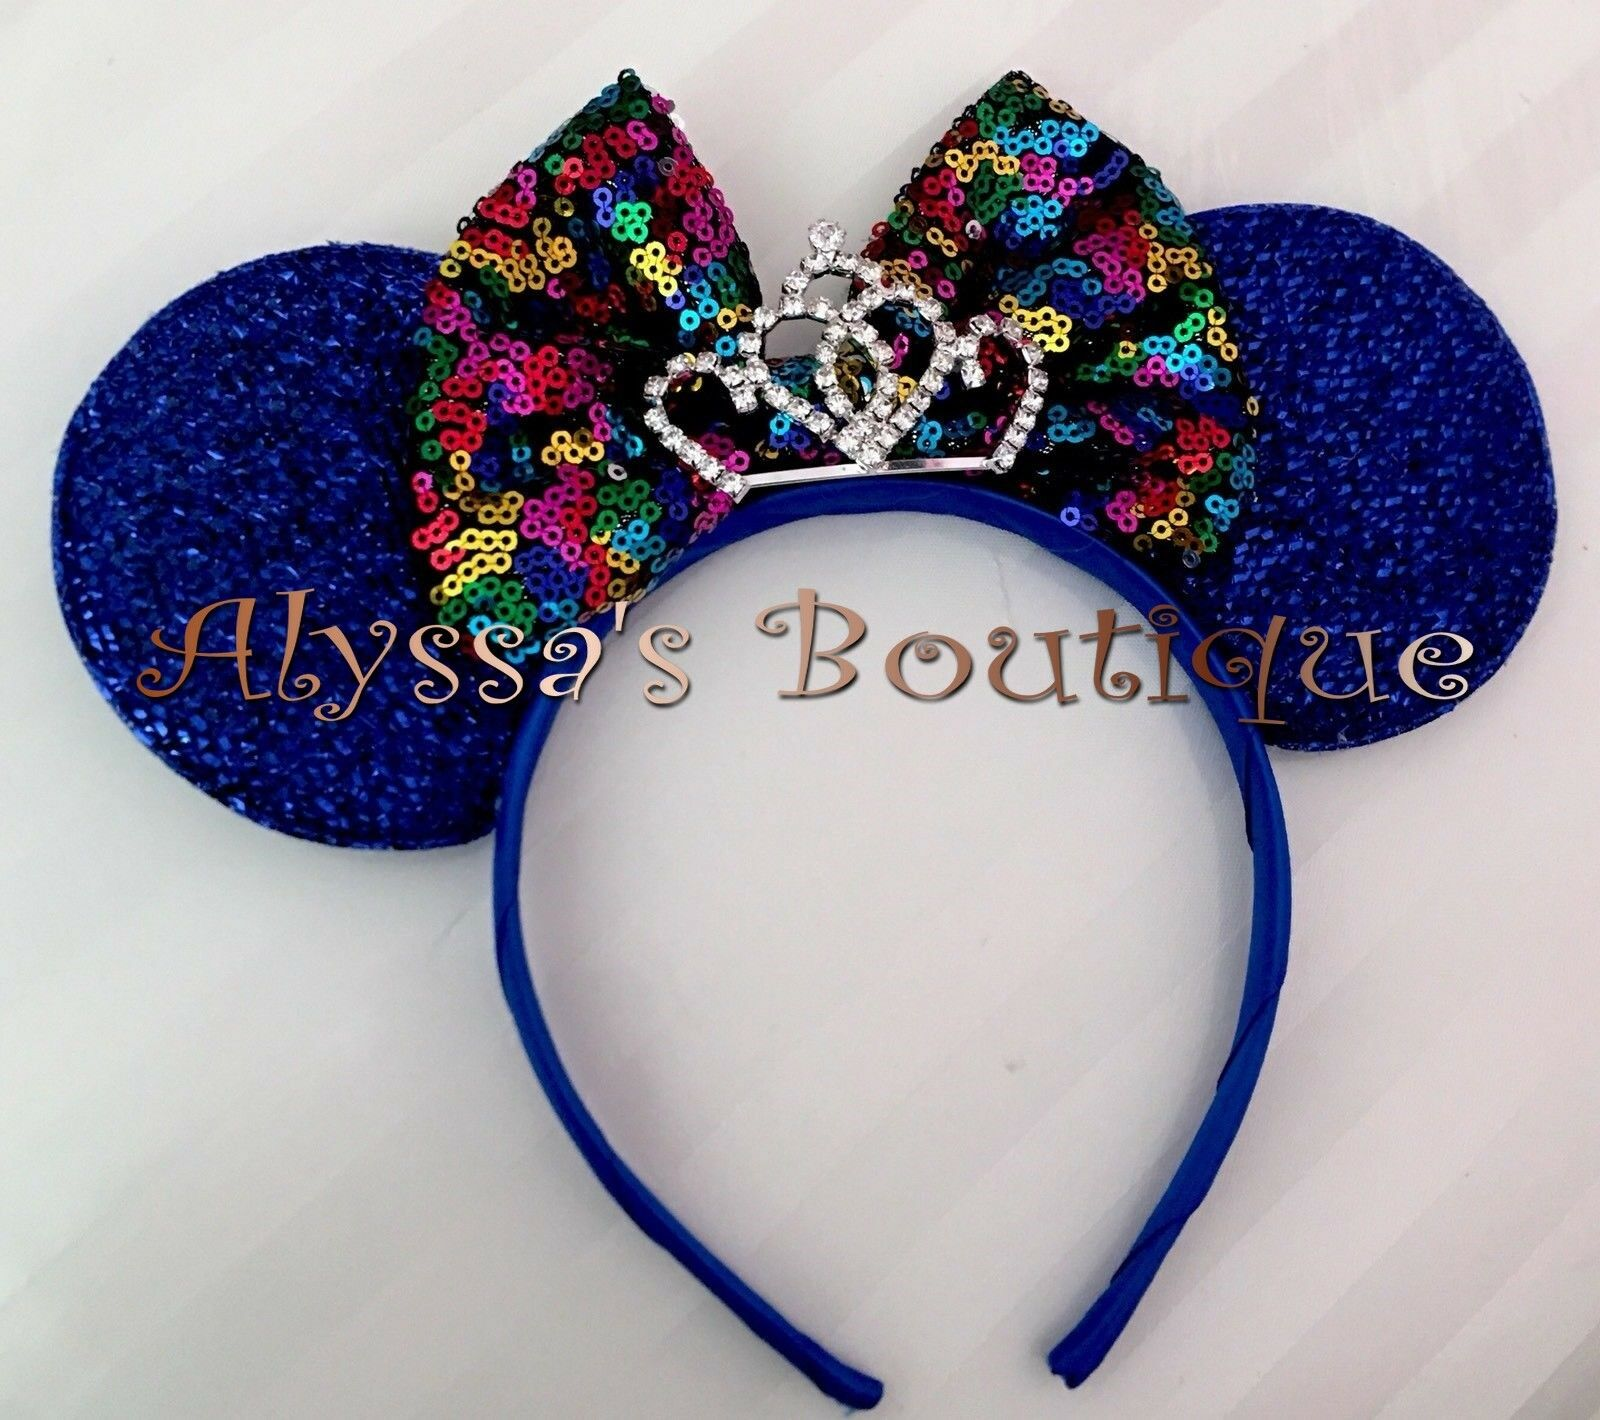 *NEW* Minnie Mouse Ears Tiara Headband Shiny Red Sequin Rainbow Multicolors Bow